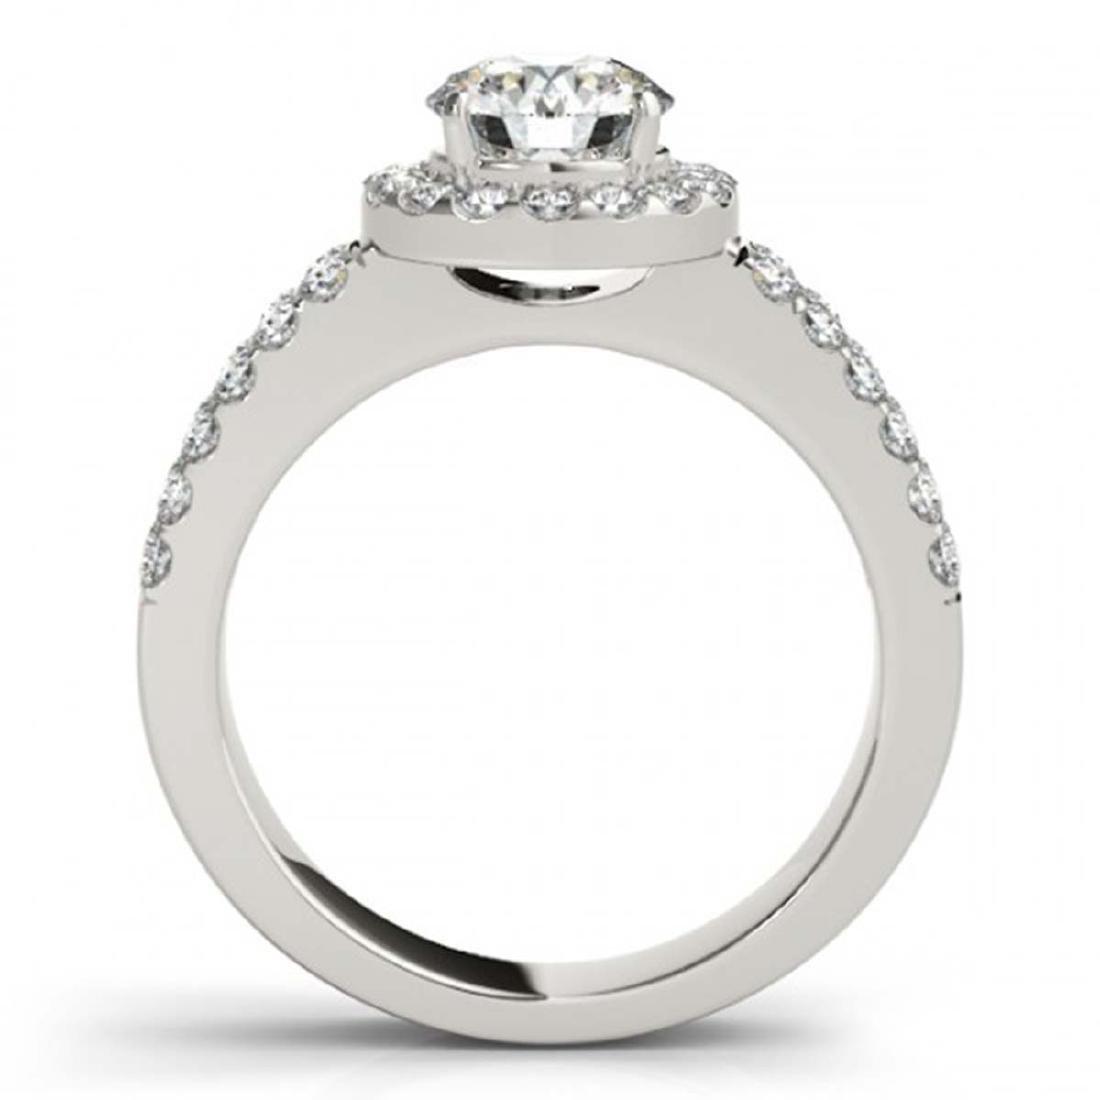 0.85 ctw VS/SI Diamond Halo Ring 14K White Gold - - 2